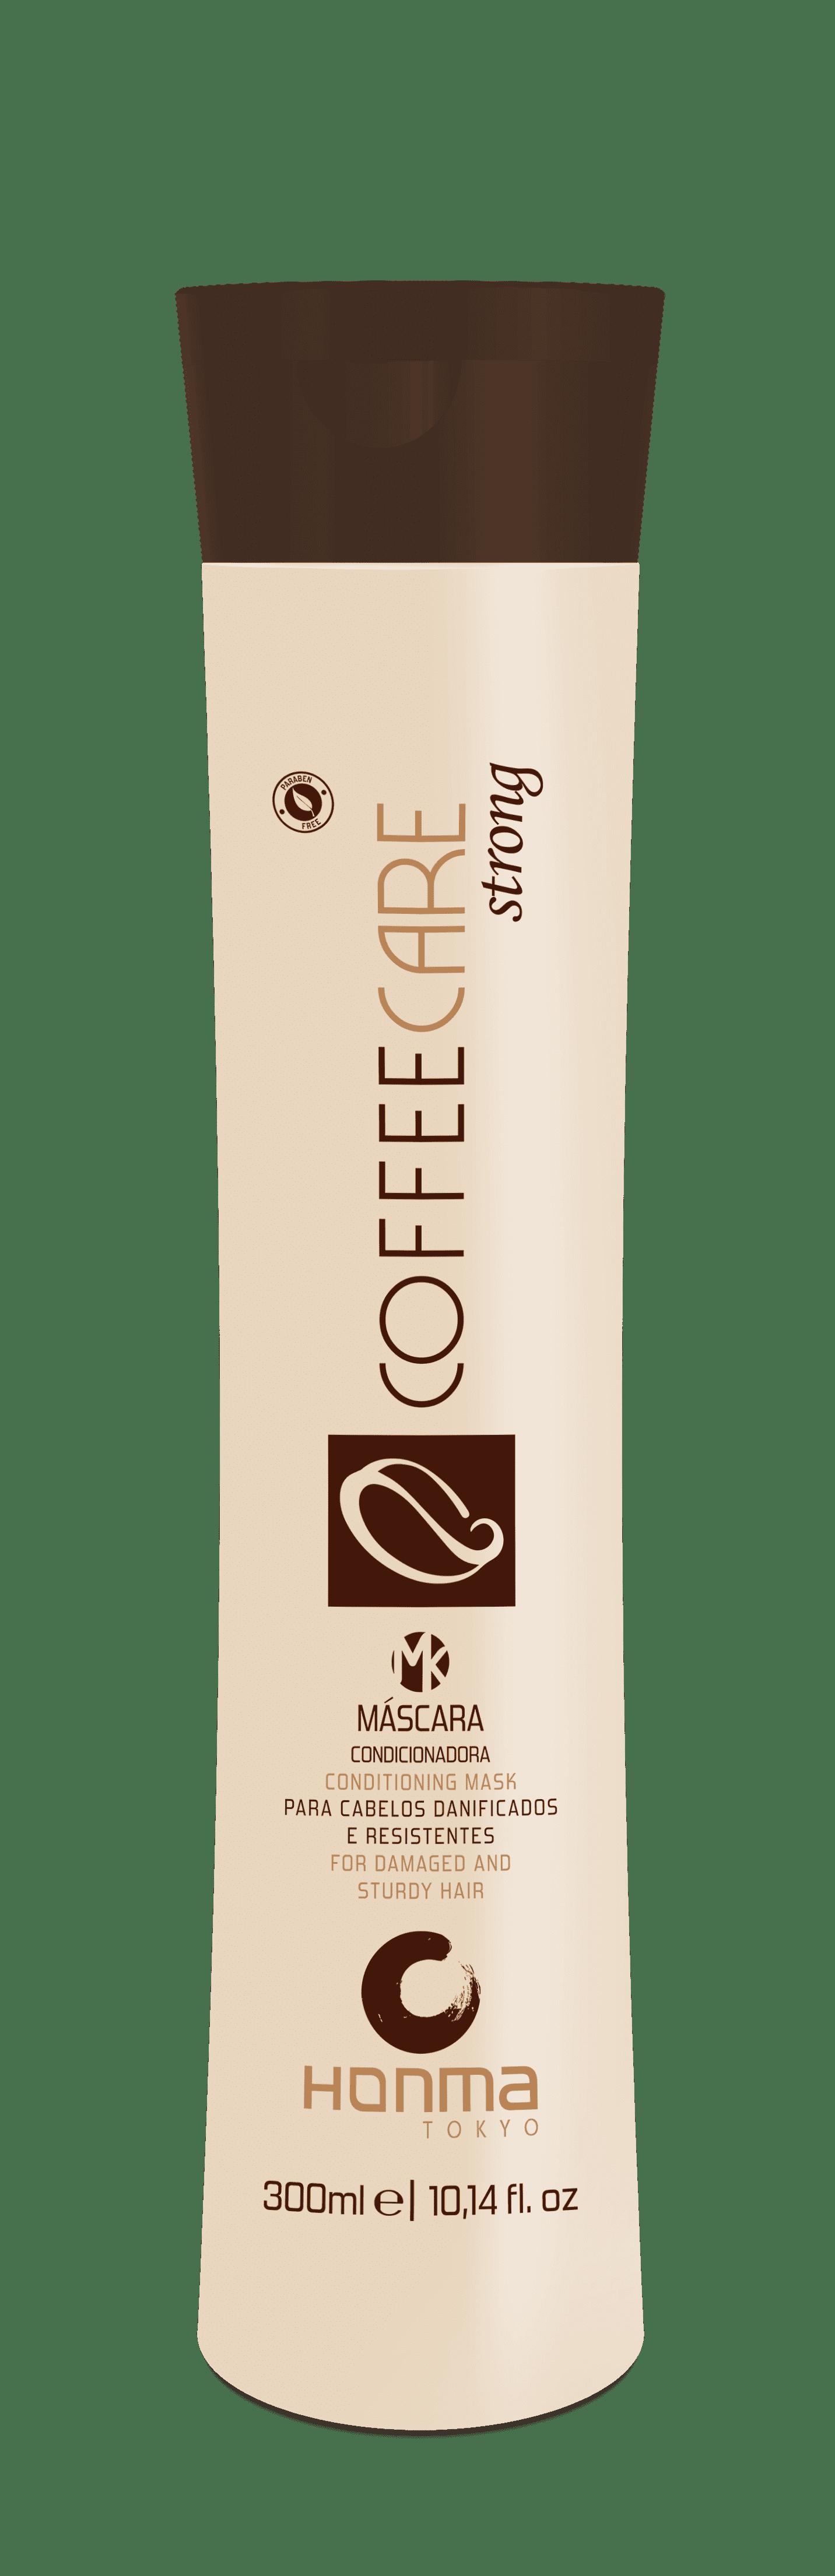 Honma Tokyo Coffee Care Strong Кондиционирующая маска восстановление и защита honma tokyo кератин шаг 2 линии coffee premium all liss шаг 2 линии coffee premium all liss 500 мл